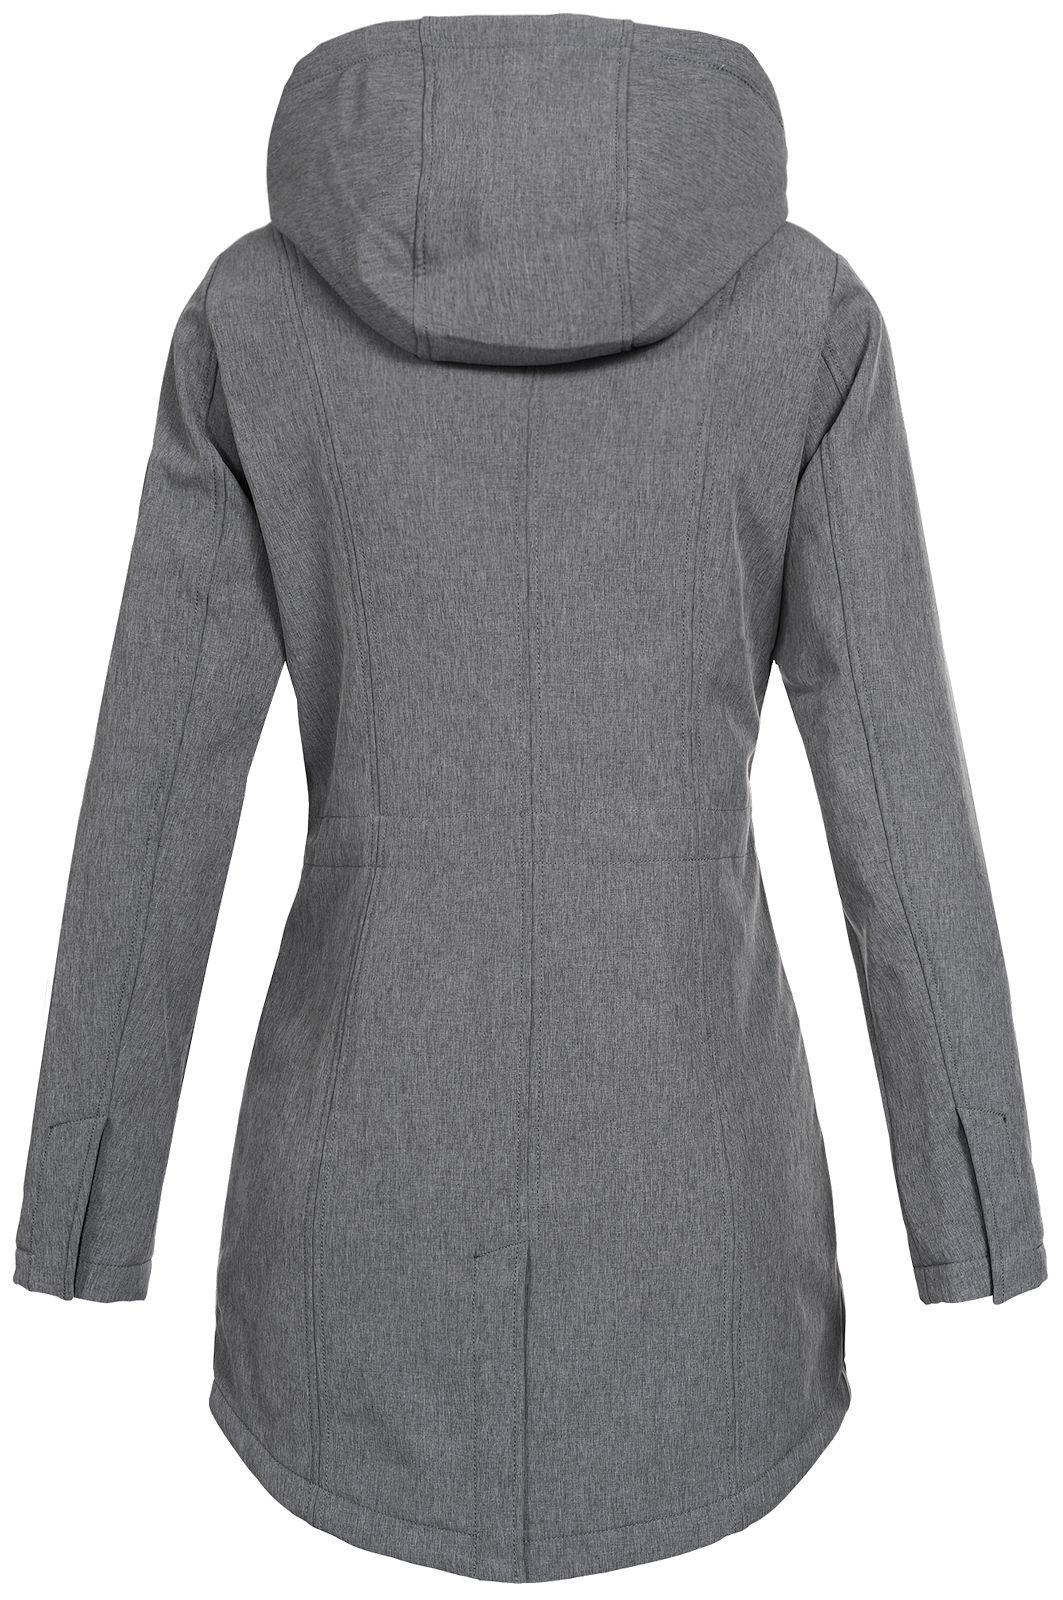 Top Fuel Fashion Damen Softshelljacke Kurzmantel Ivana